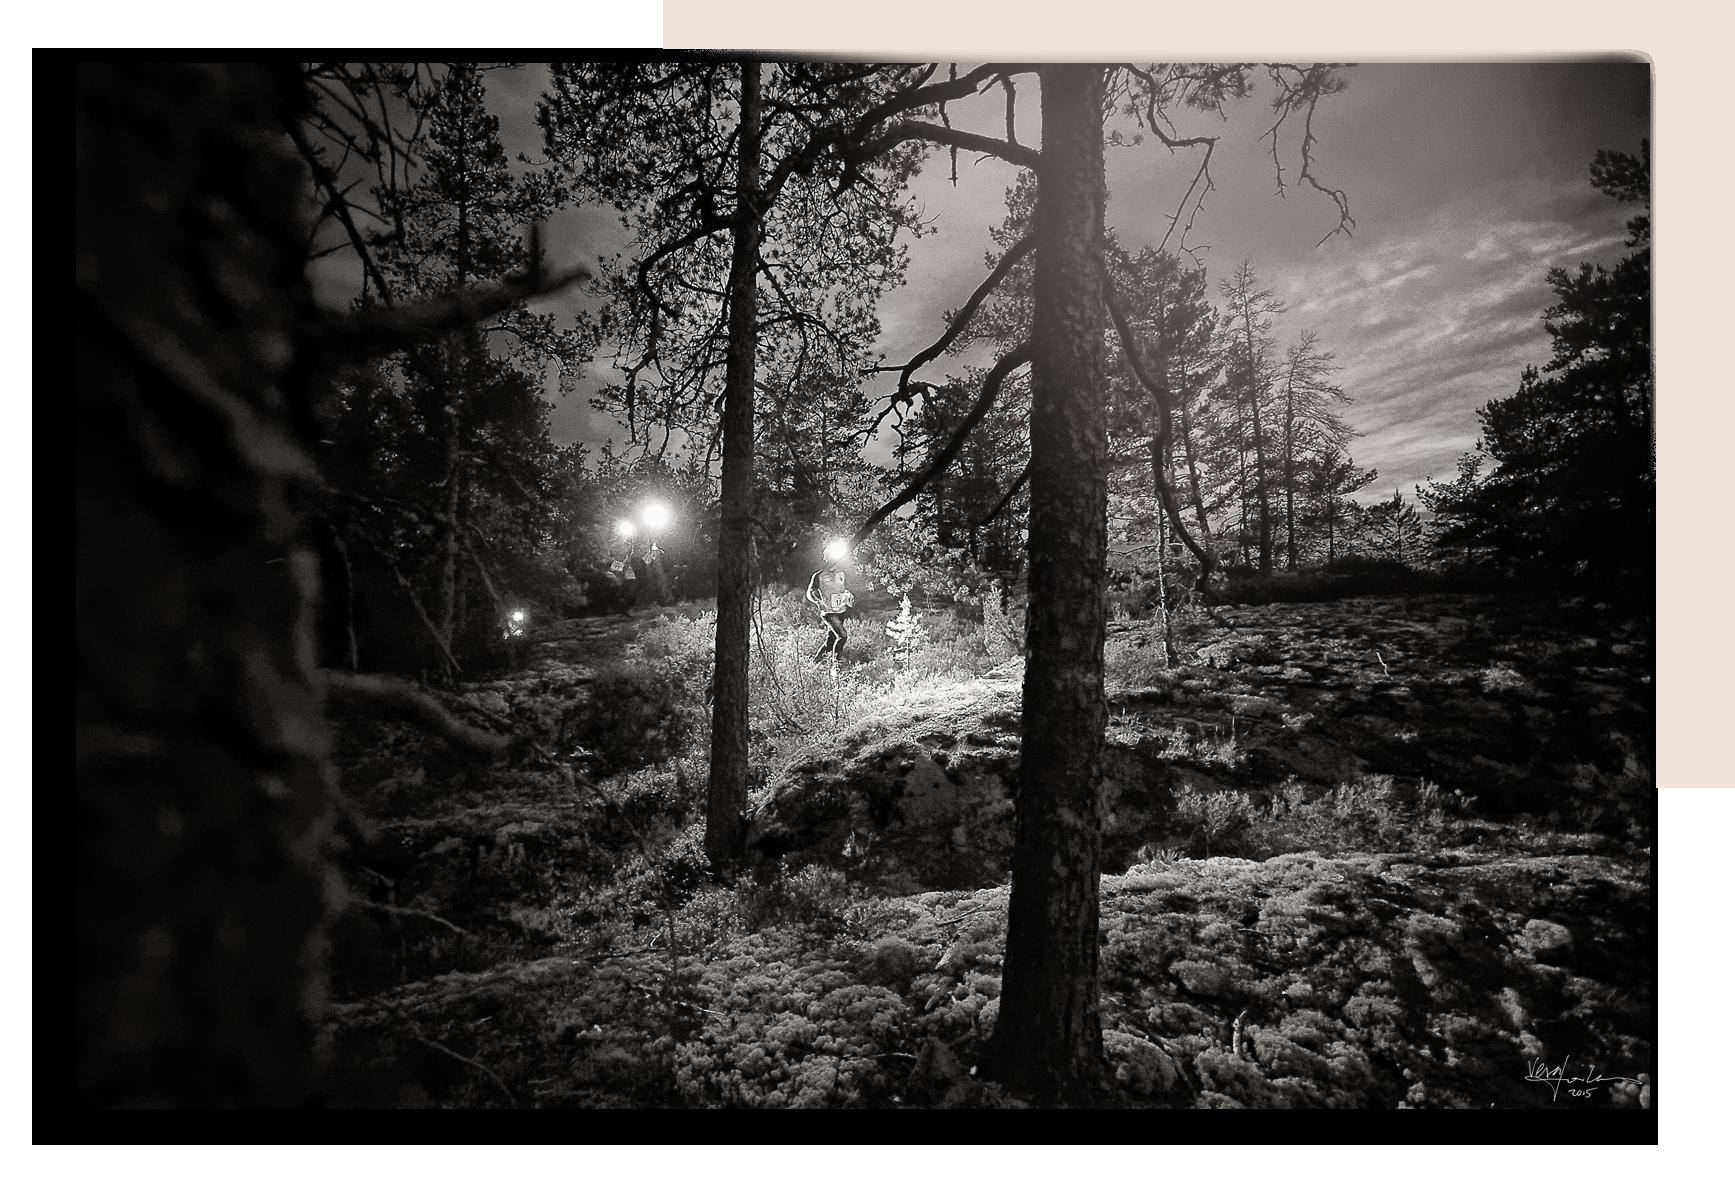 ALUMINUM EDITION-02 NIGHT-O J-STYLE -00:03 am June 14th, 2015 · Pauhojanmäki, Paimio, Finland